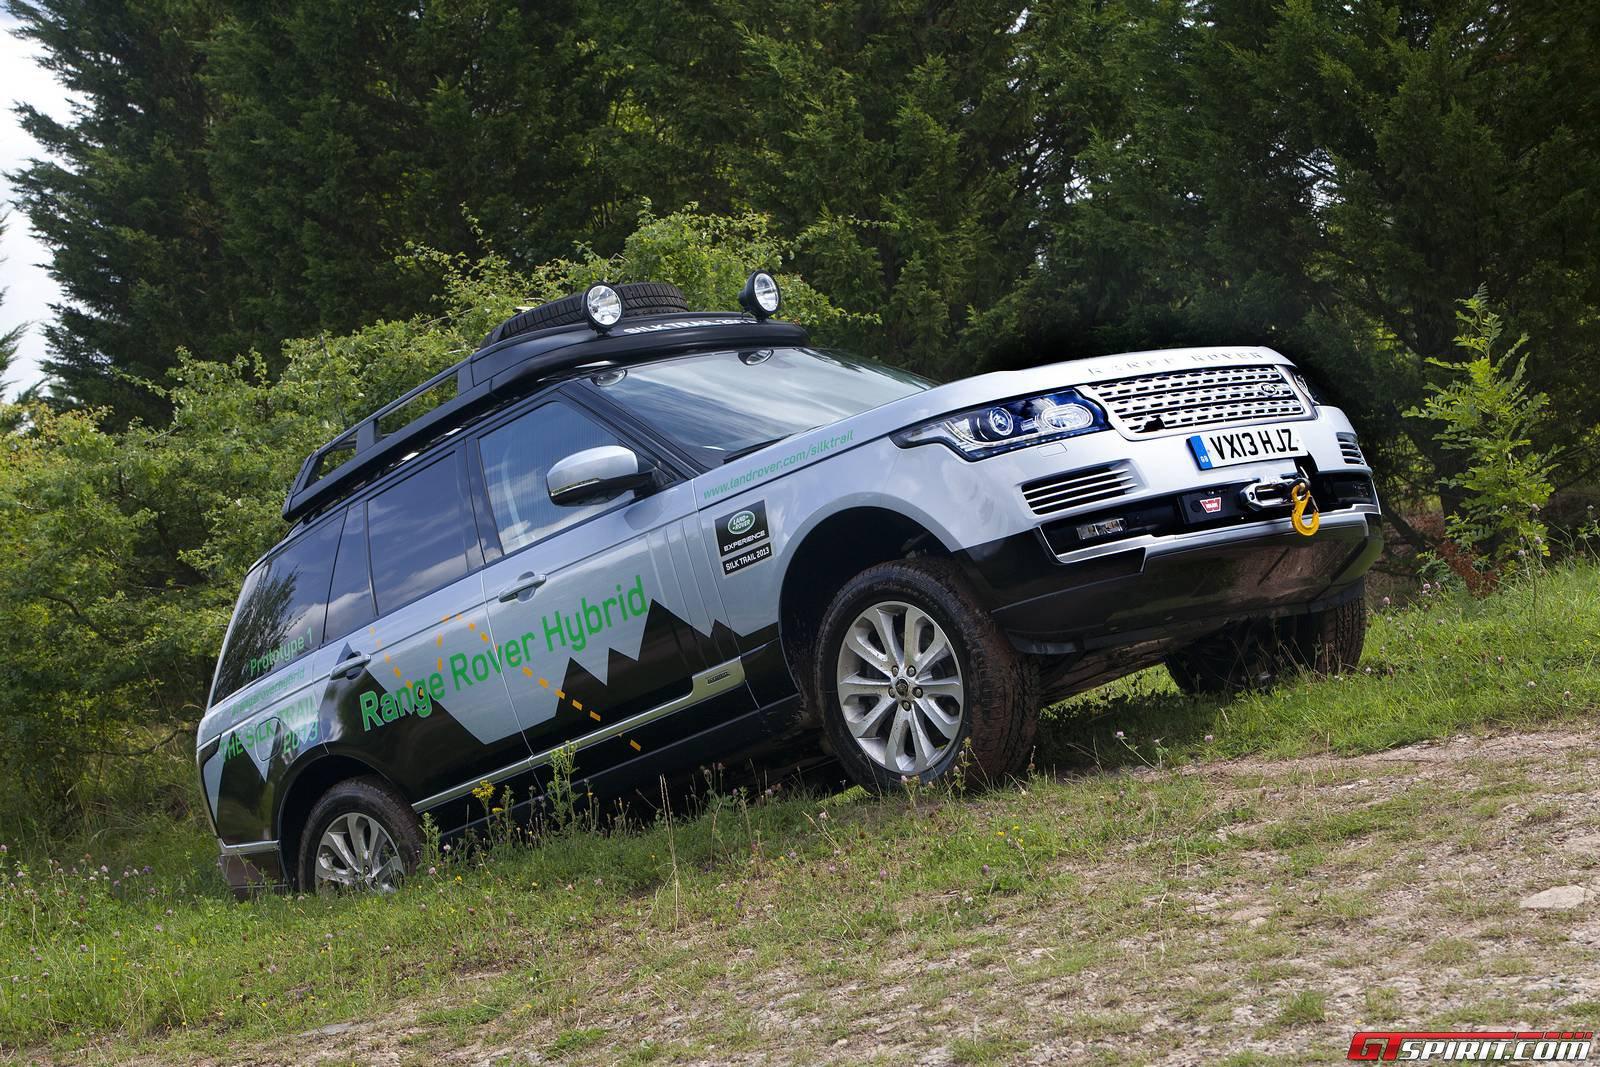 official range rover hybrid and range rover sport hybrid gtspirit. Black Bedroom Furniture Sets. Home Design Ideas